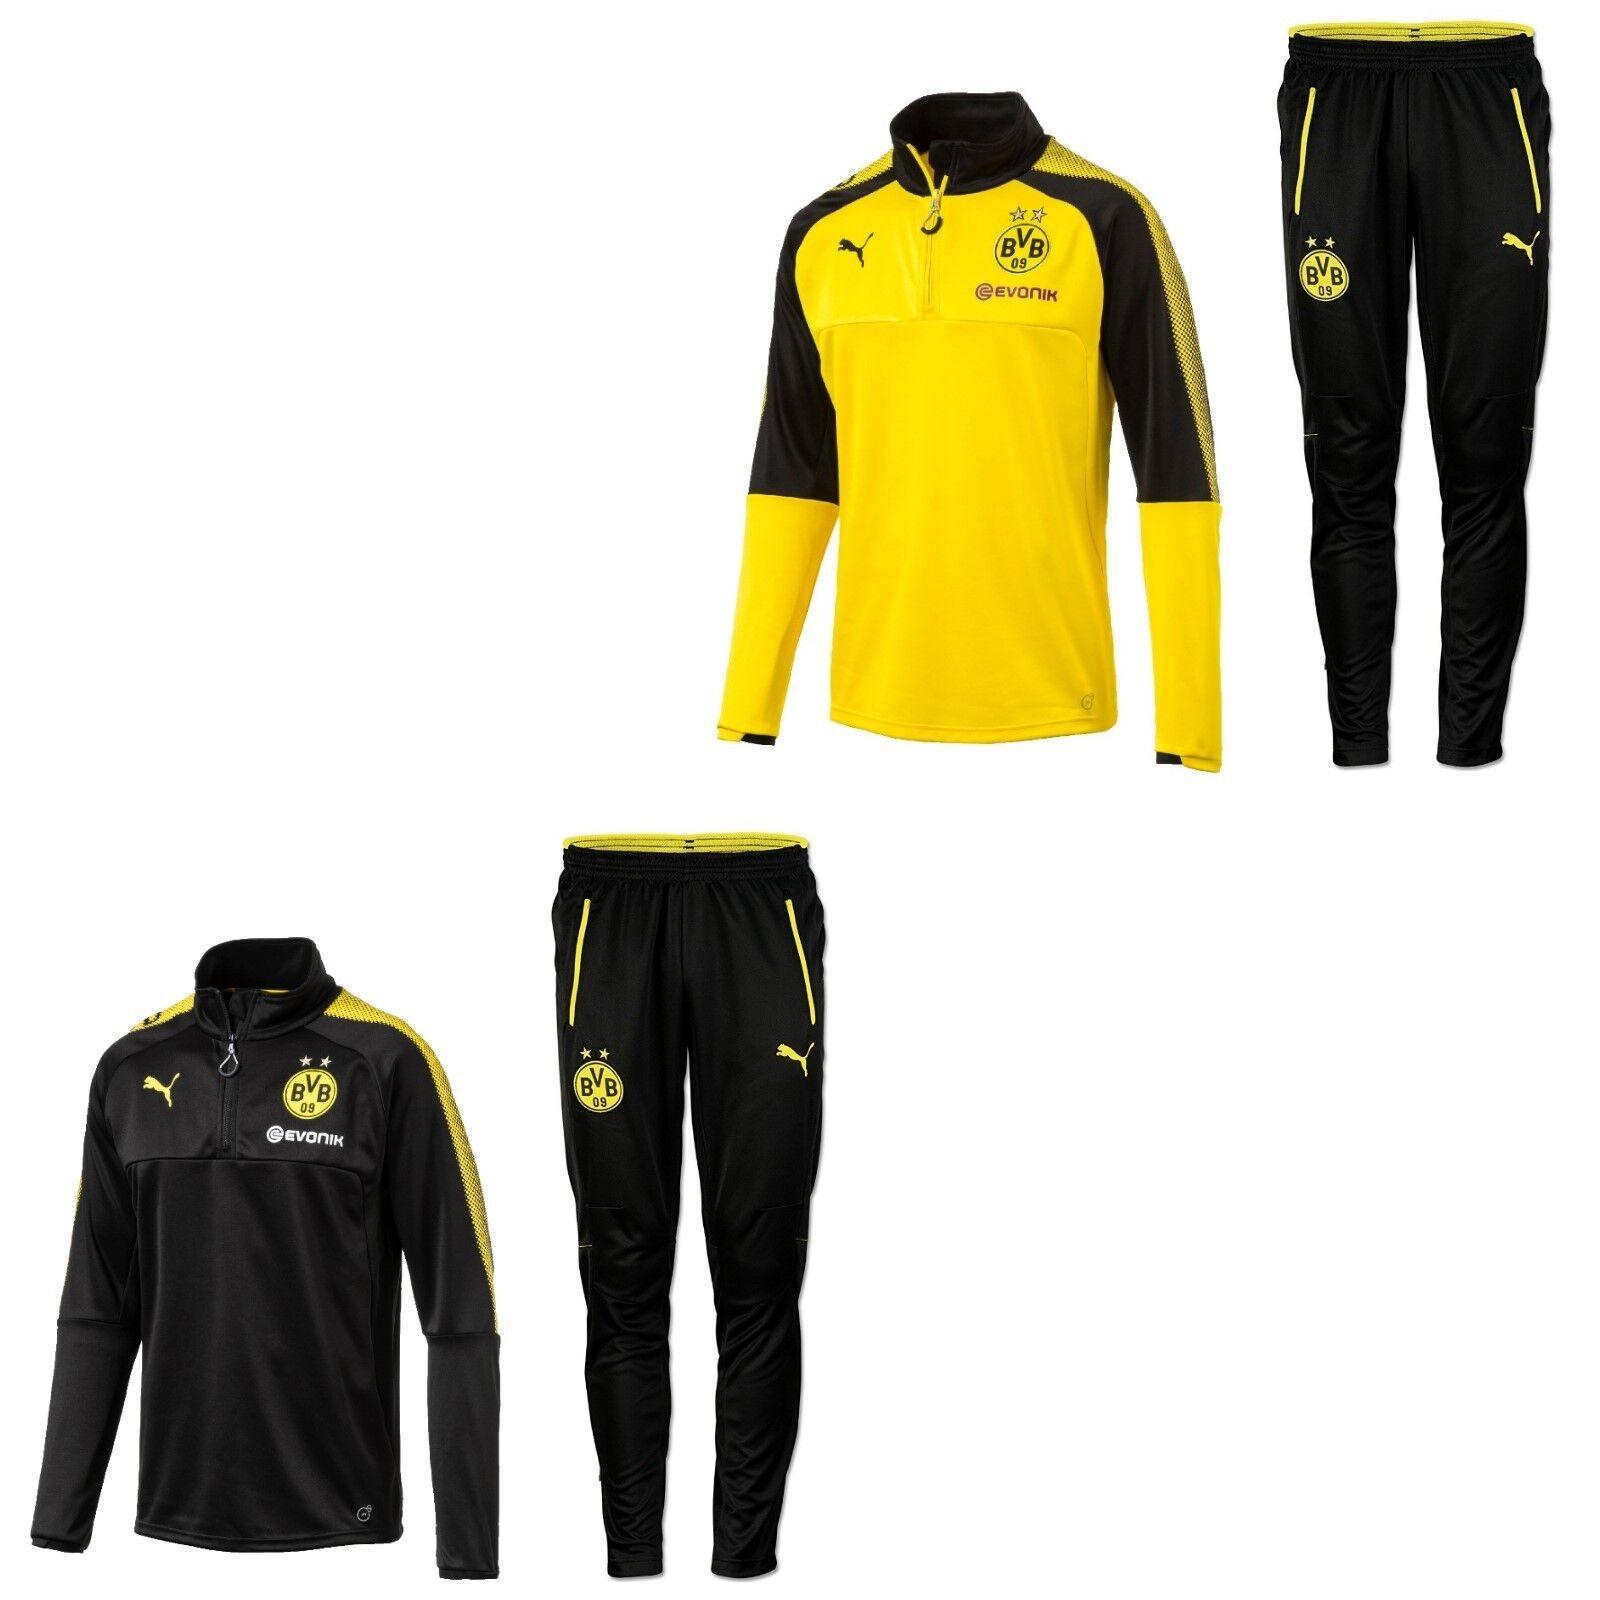 Puma BVB Borussia Dortmund Trainingsanzug Trainingsanzug Trainingsanzug Sportanzug mit Half Zip 2017 - 2018 b17978